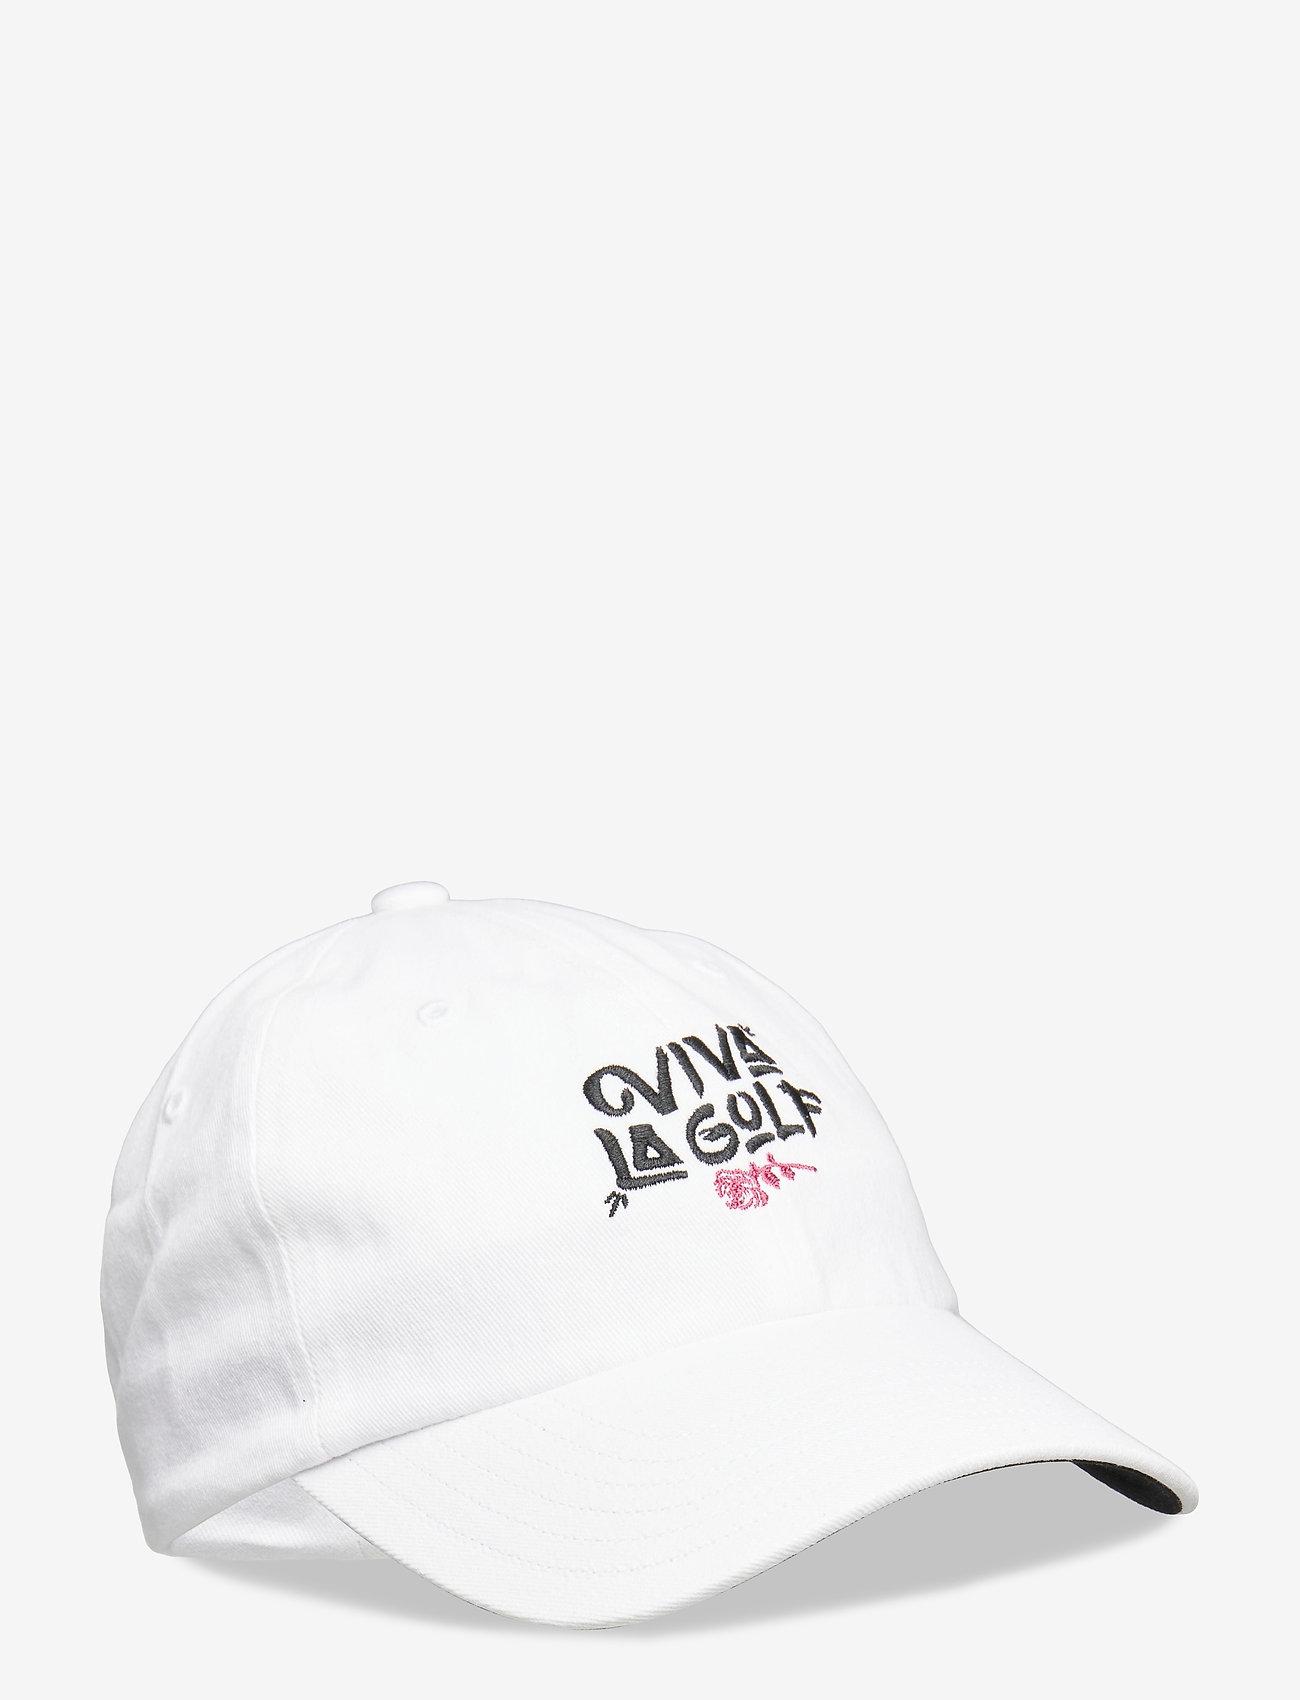 adidas Golf - W NOVELTY HAT - kepsar - white - 0